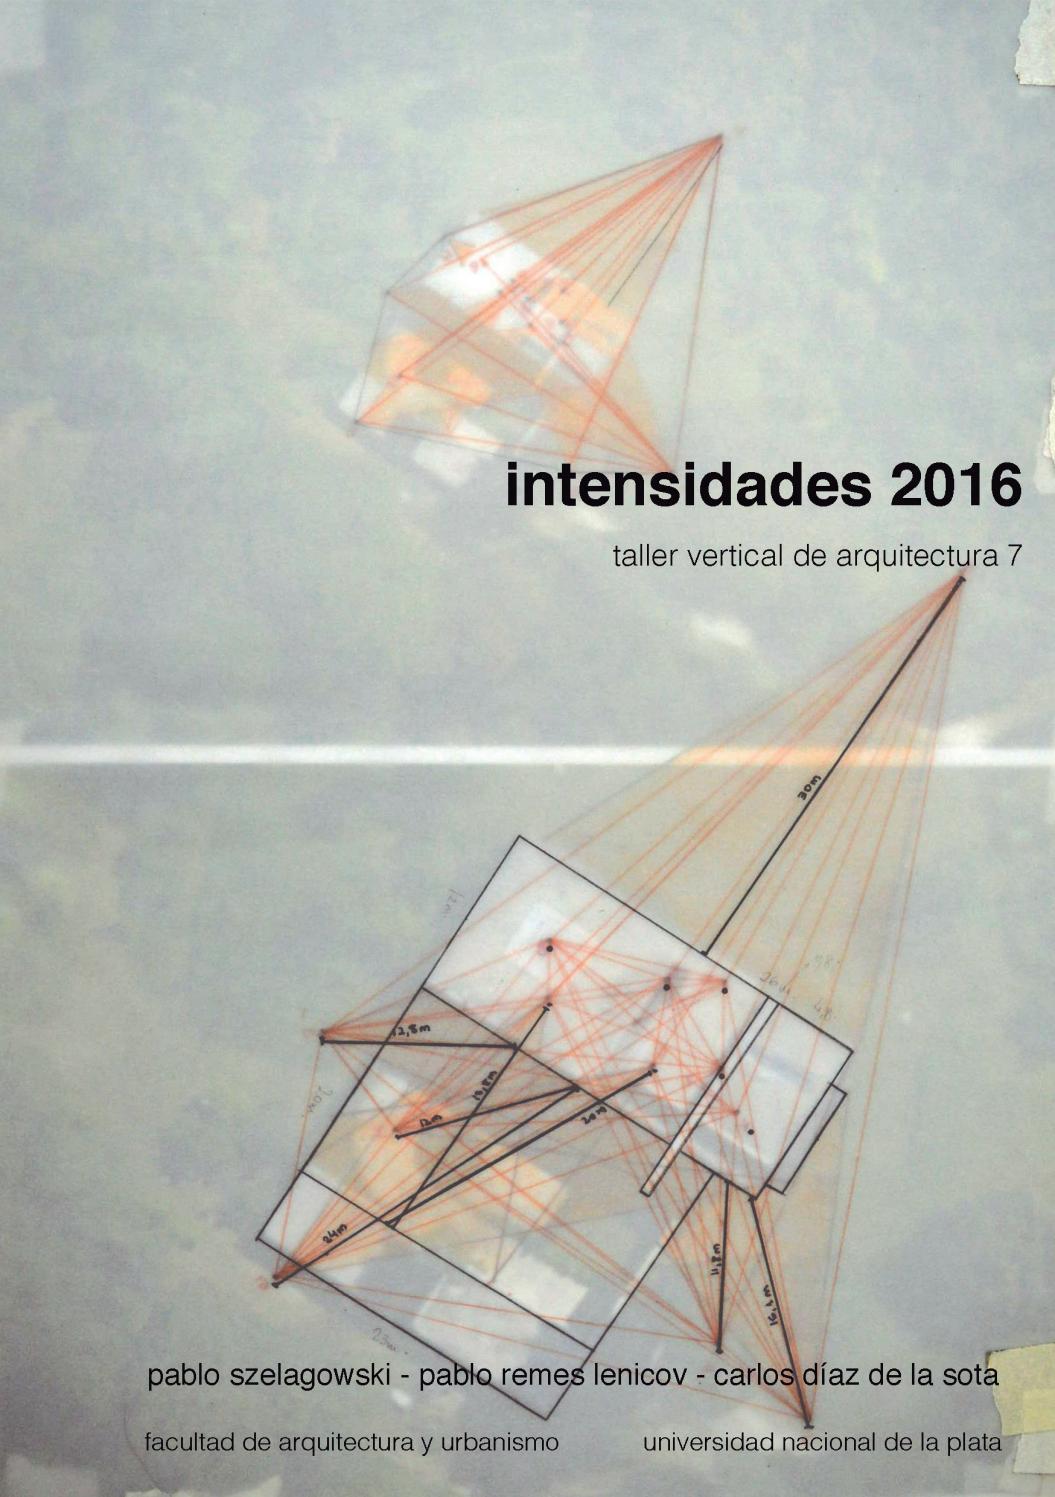 Intensidades arqui 2016 by Taller7 - issuu